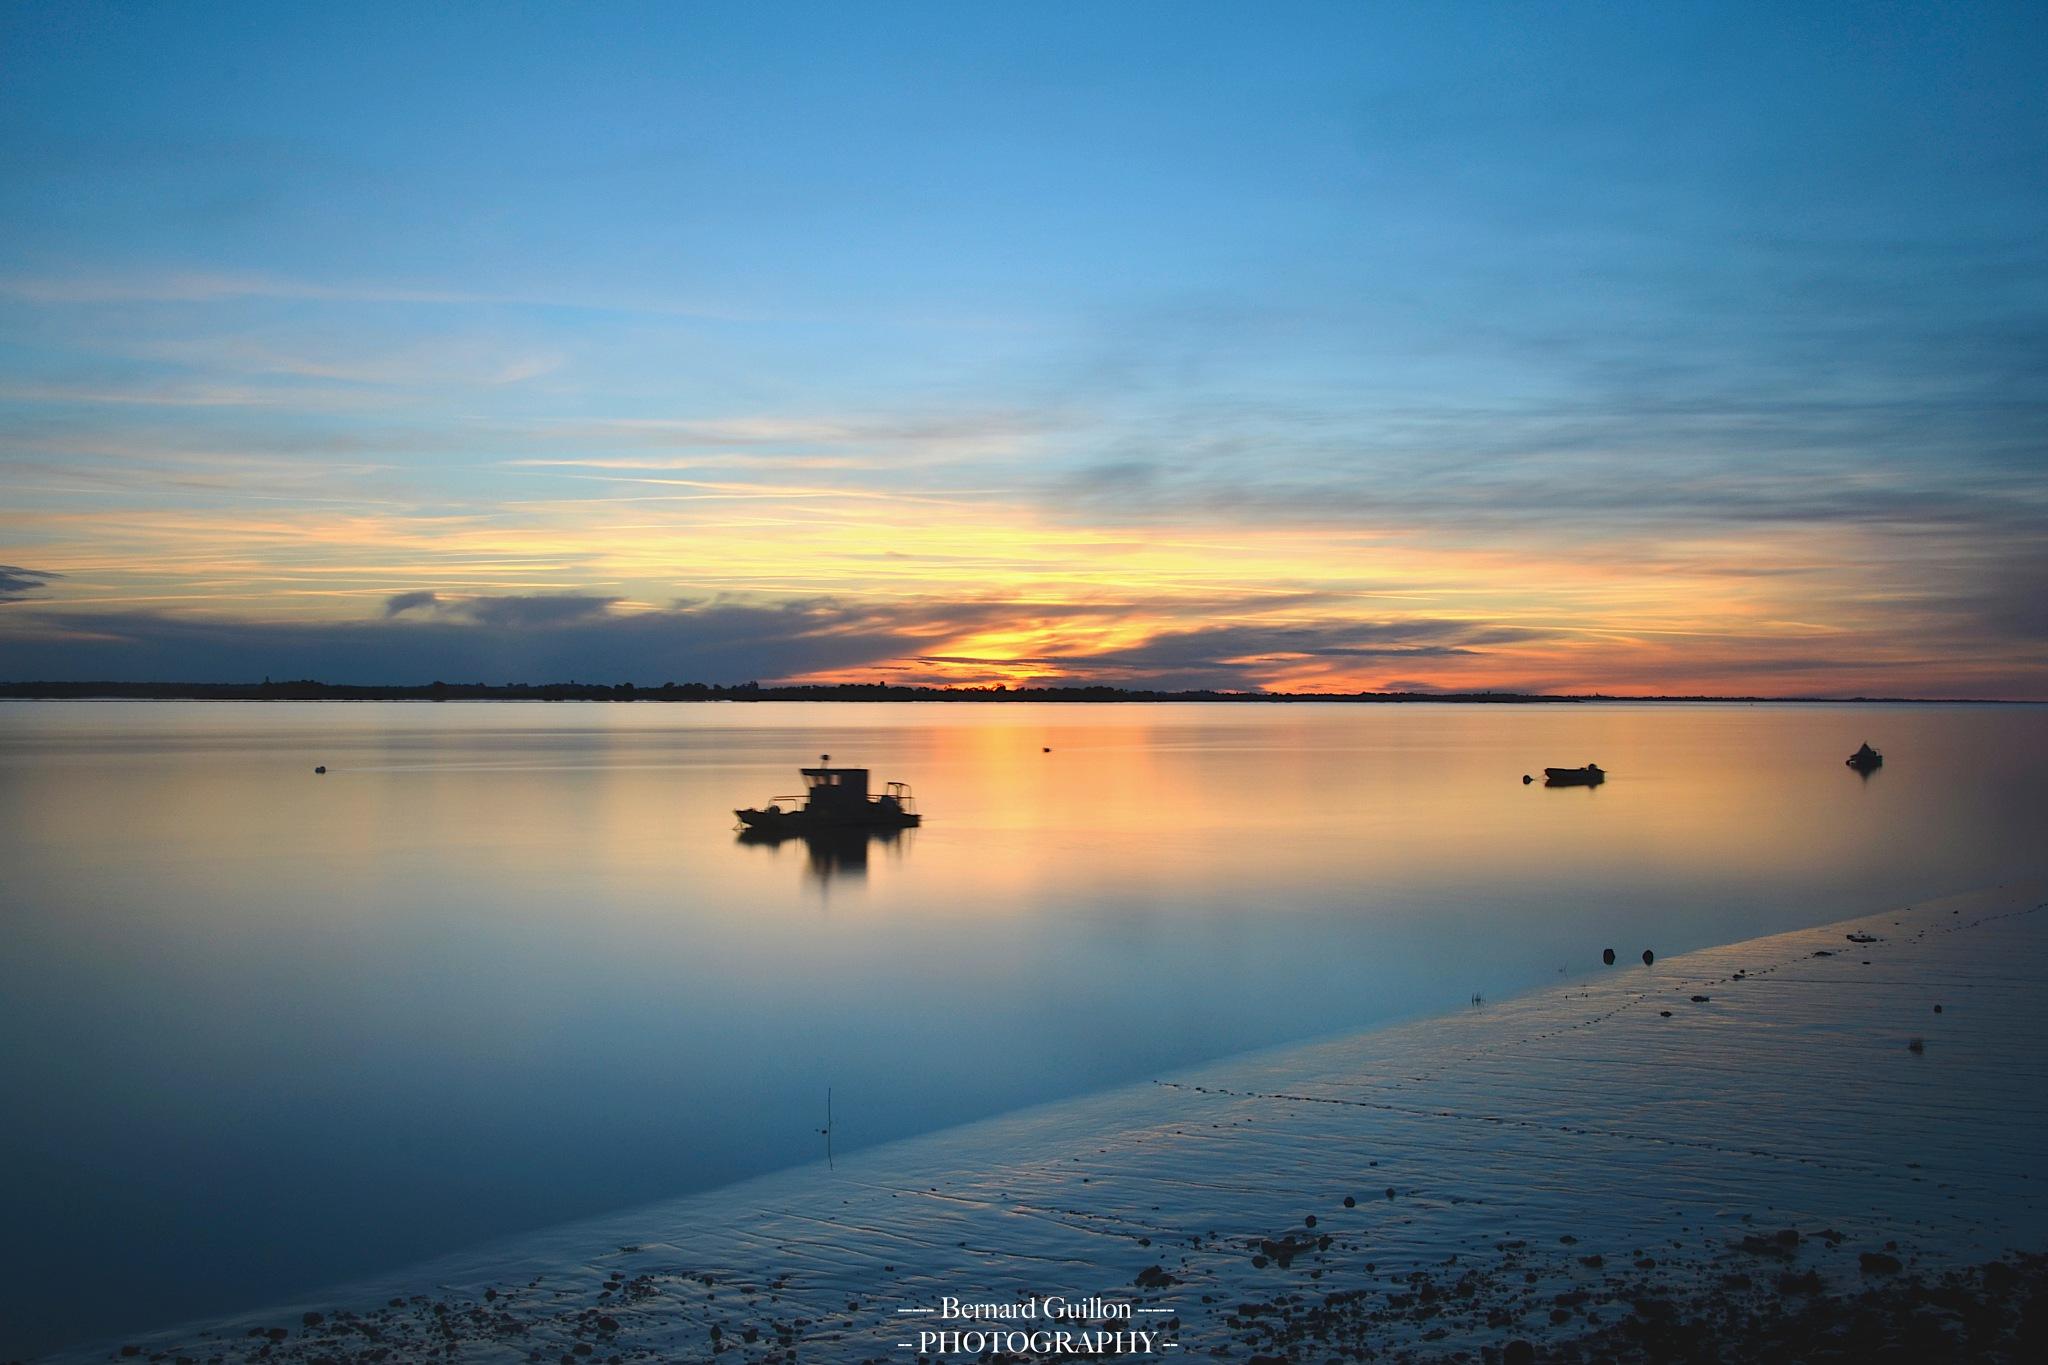 Blue hour on the estuary by Bernard Guillon